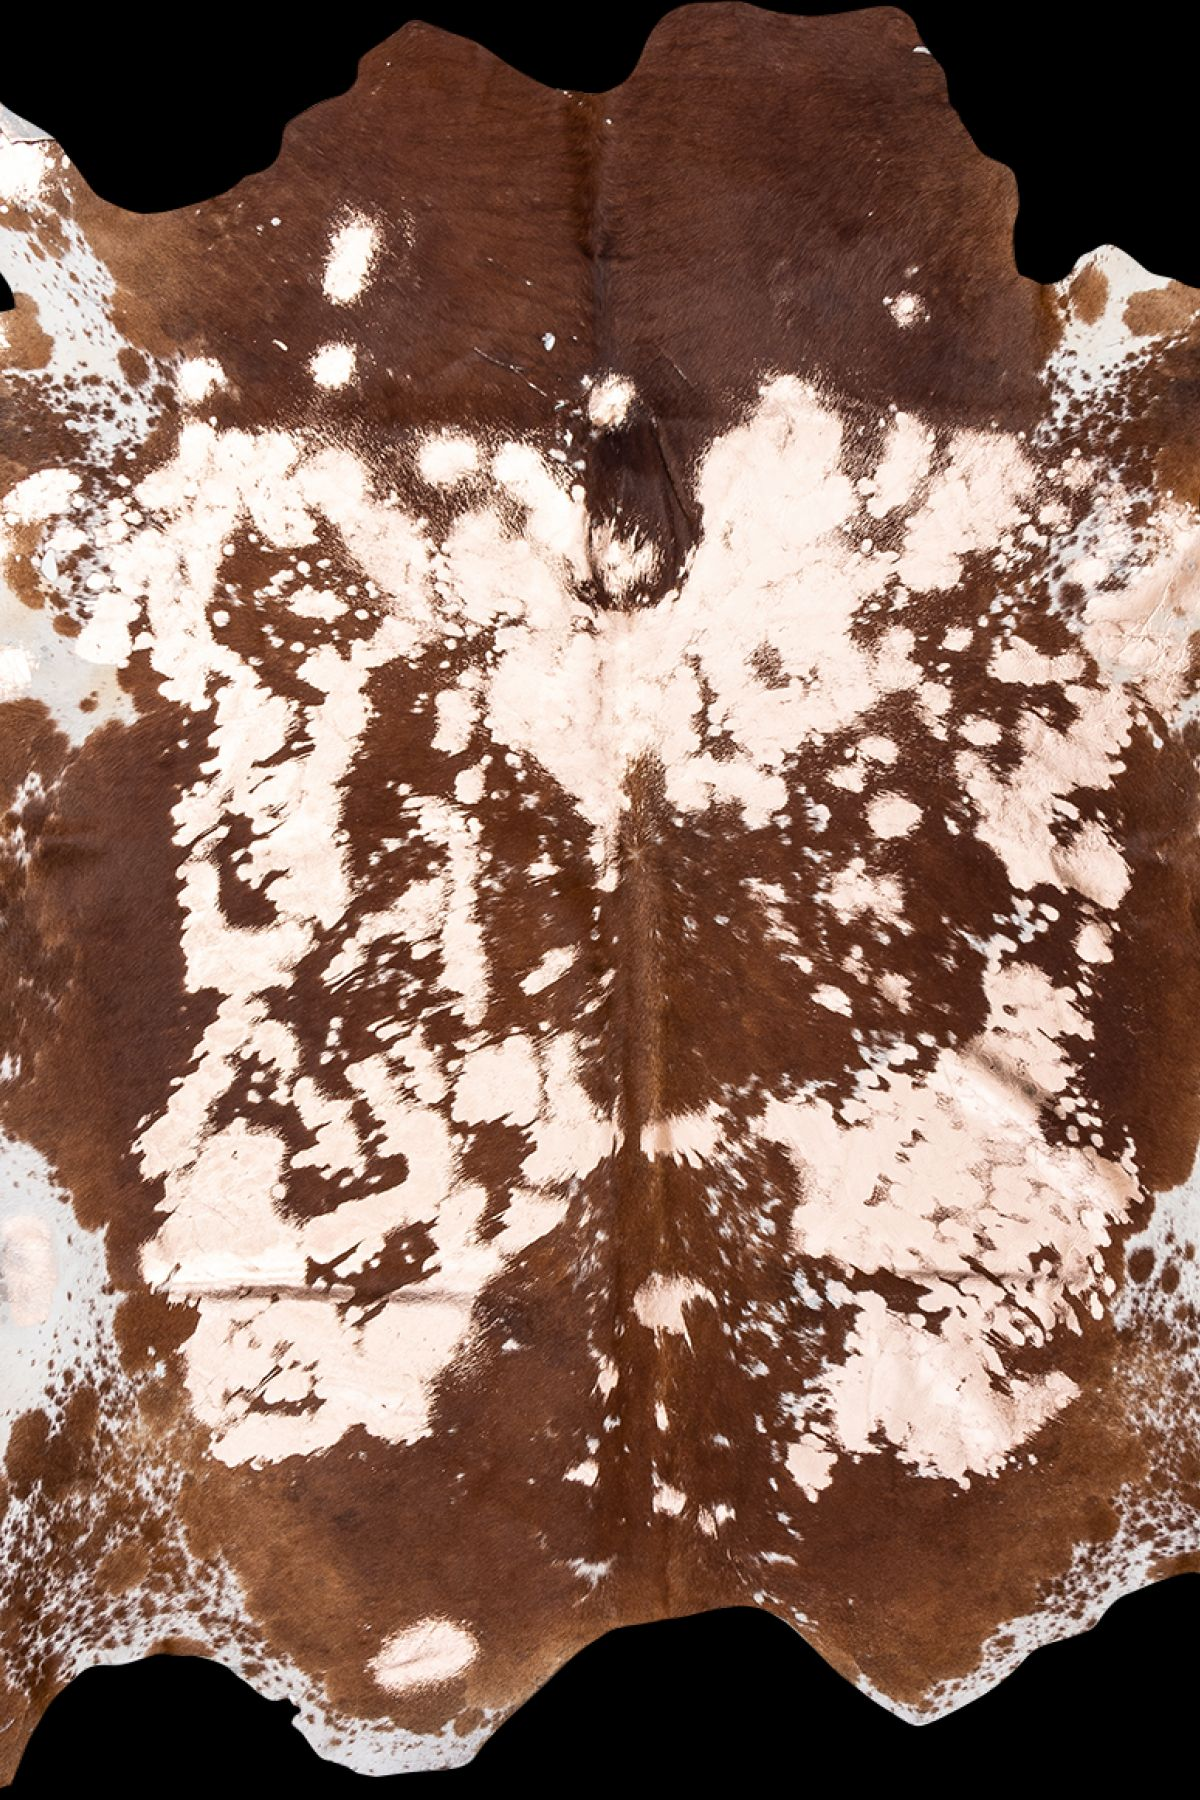 Erdogan Deri Genuine Calfskin Carpet Covered with Copple Colored Bronze Powder DH0125 Brown